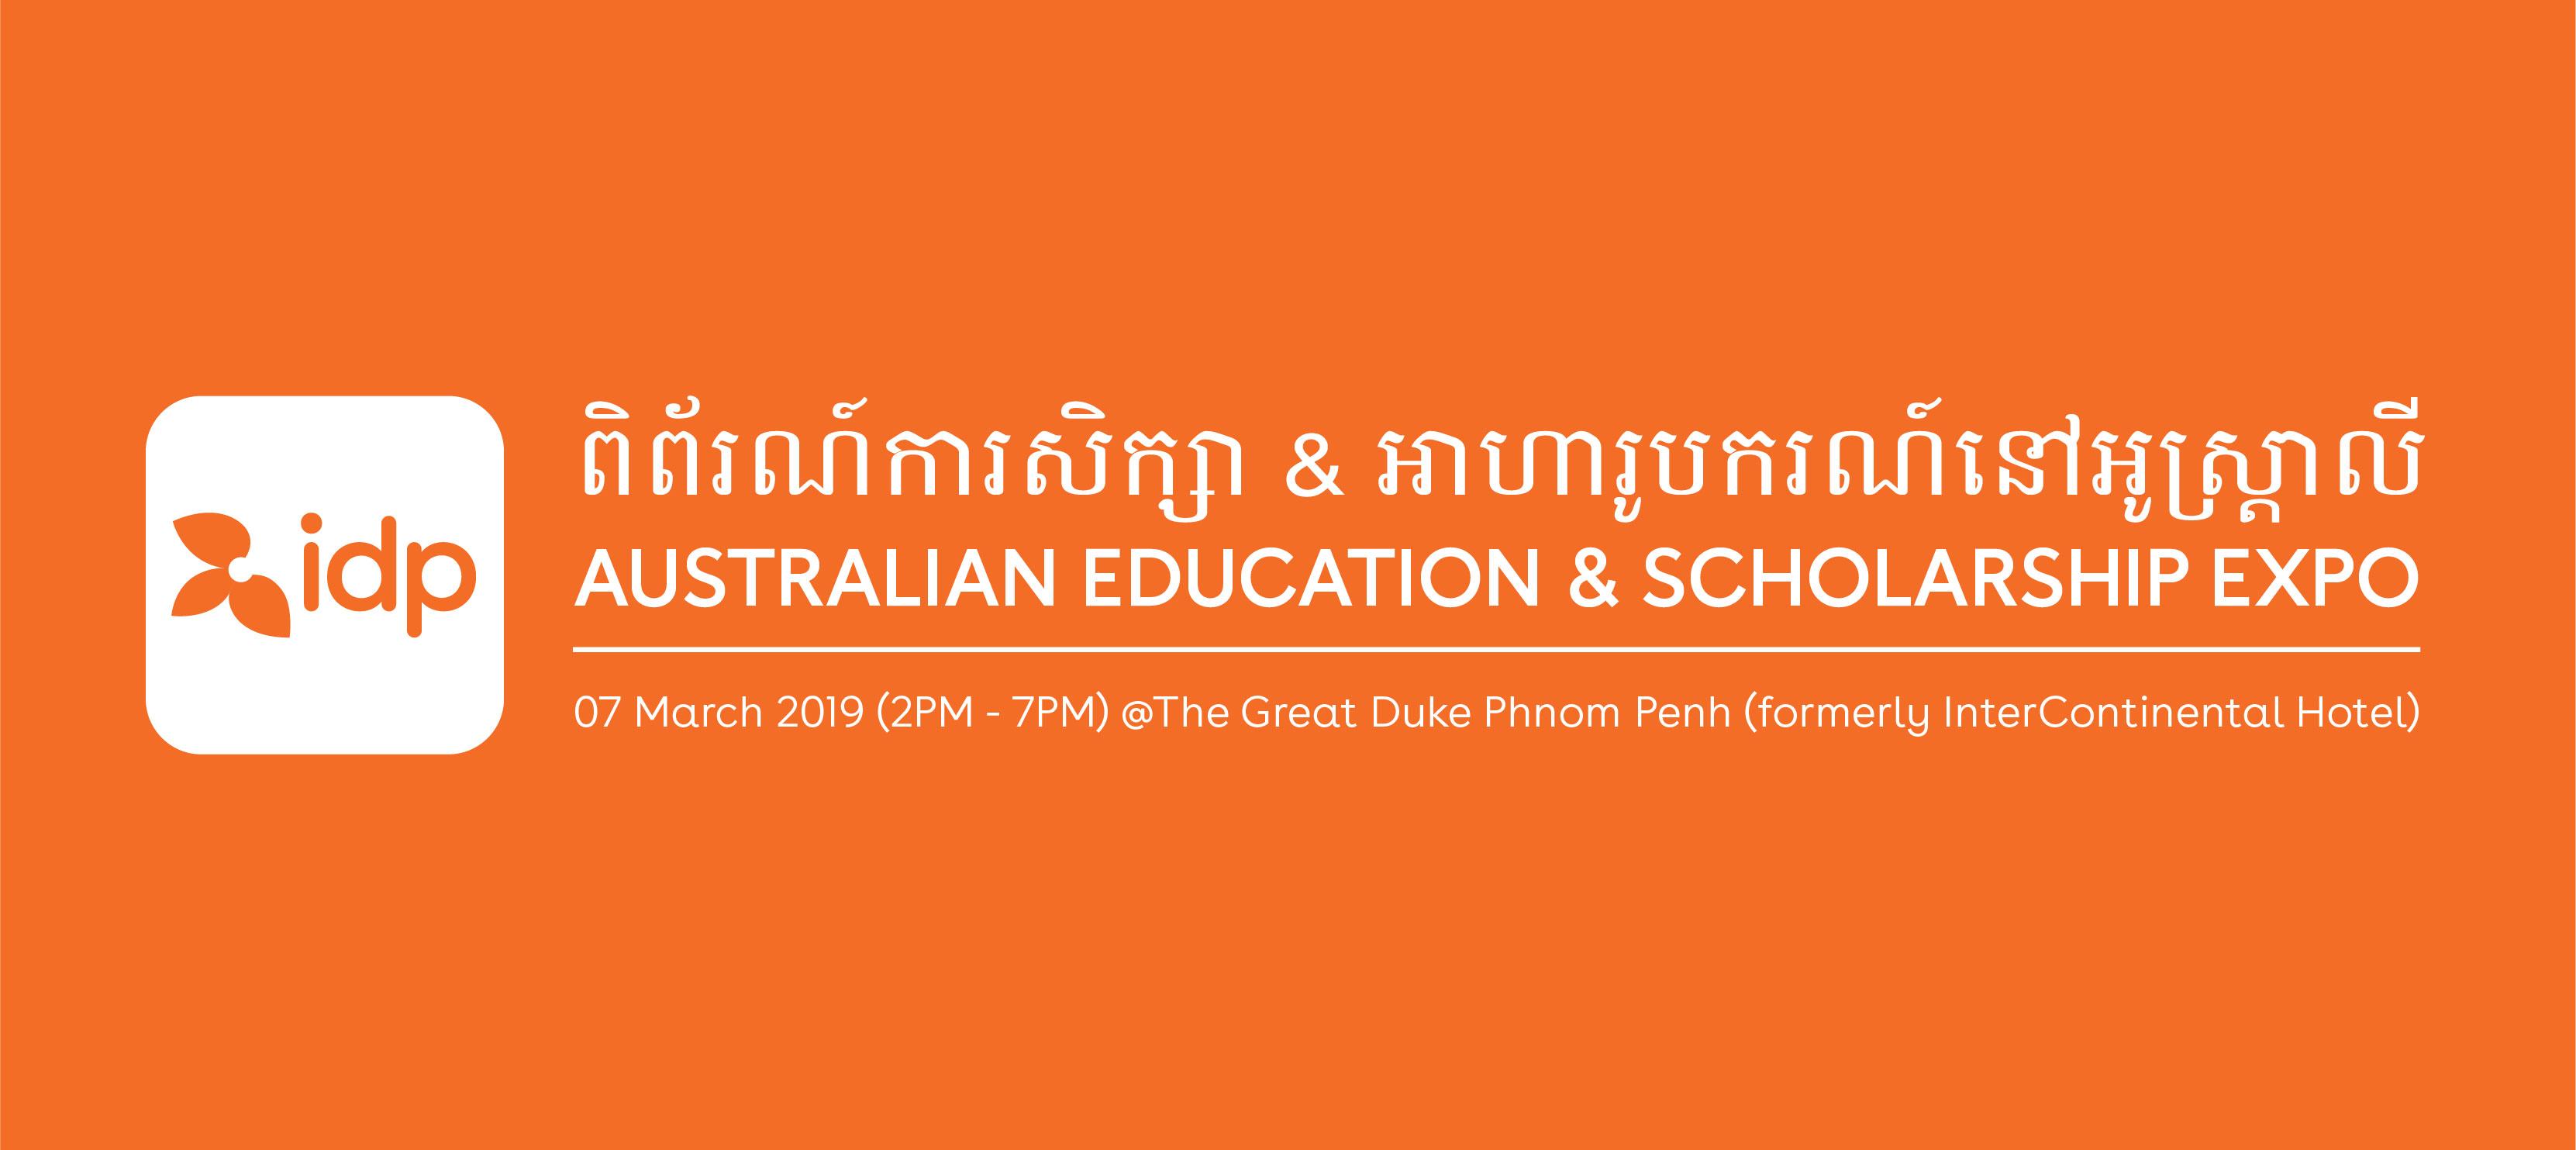 IDP Australian Education & Scholarship Expo